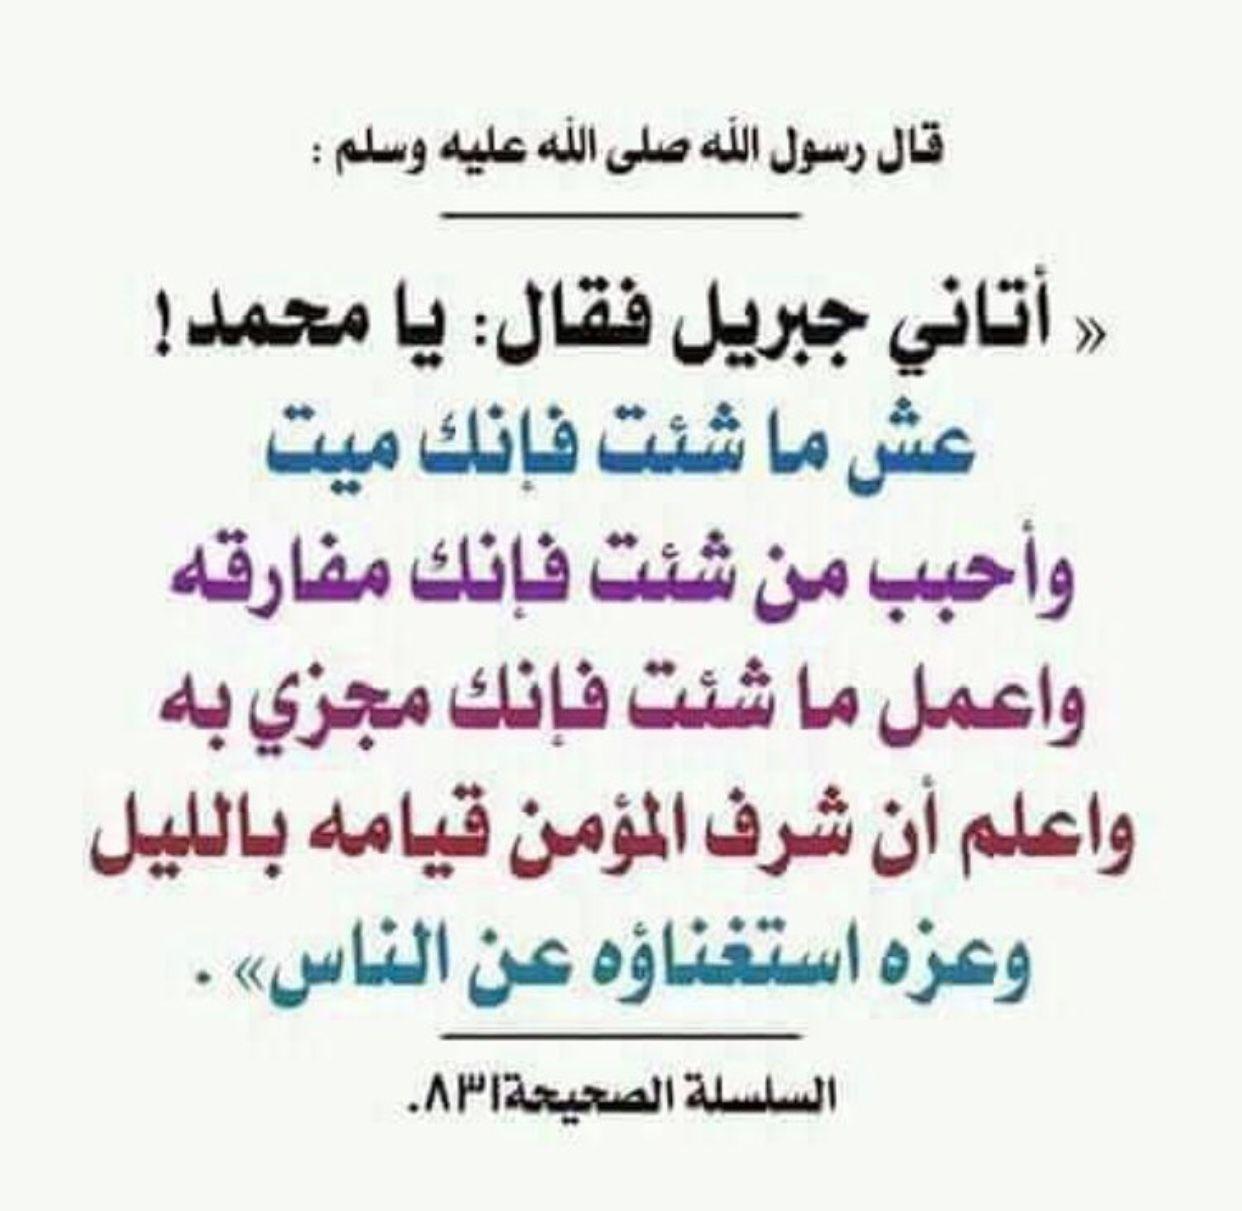 Pin By Modhi Light On احاديث الرسول ﷺ Islamic Quotes Hadith Ahadith